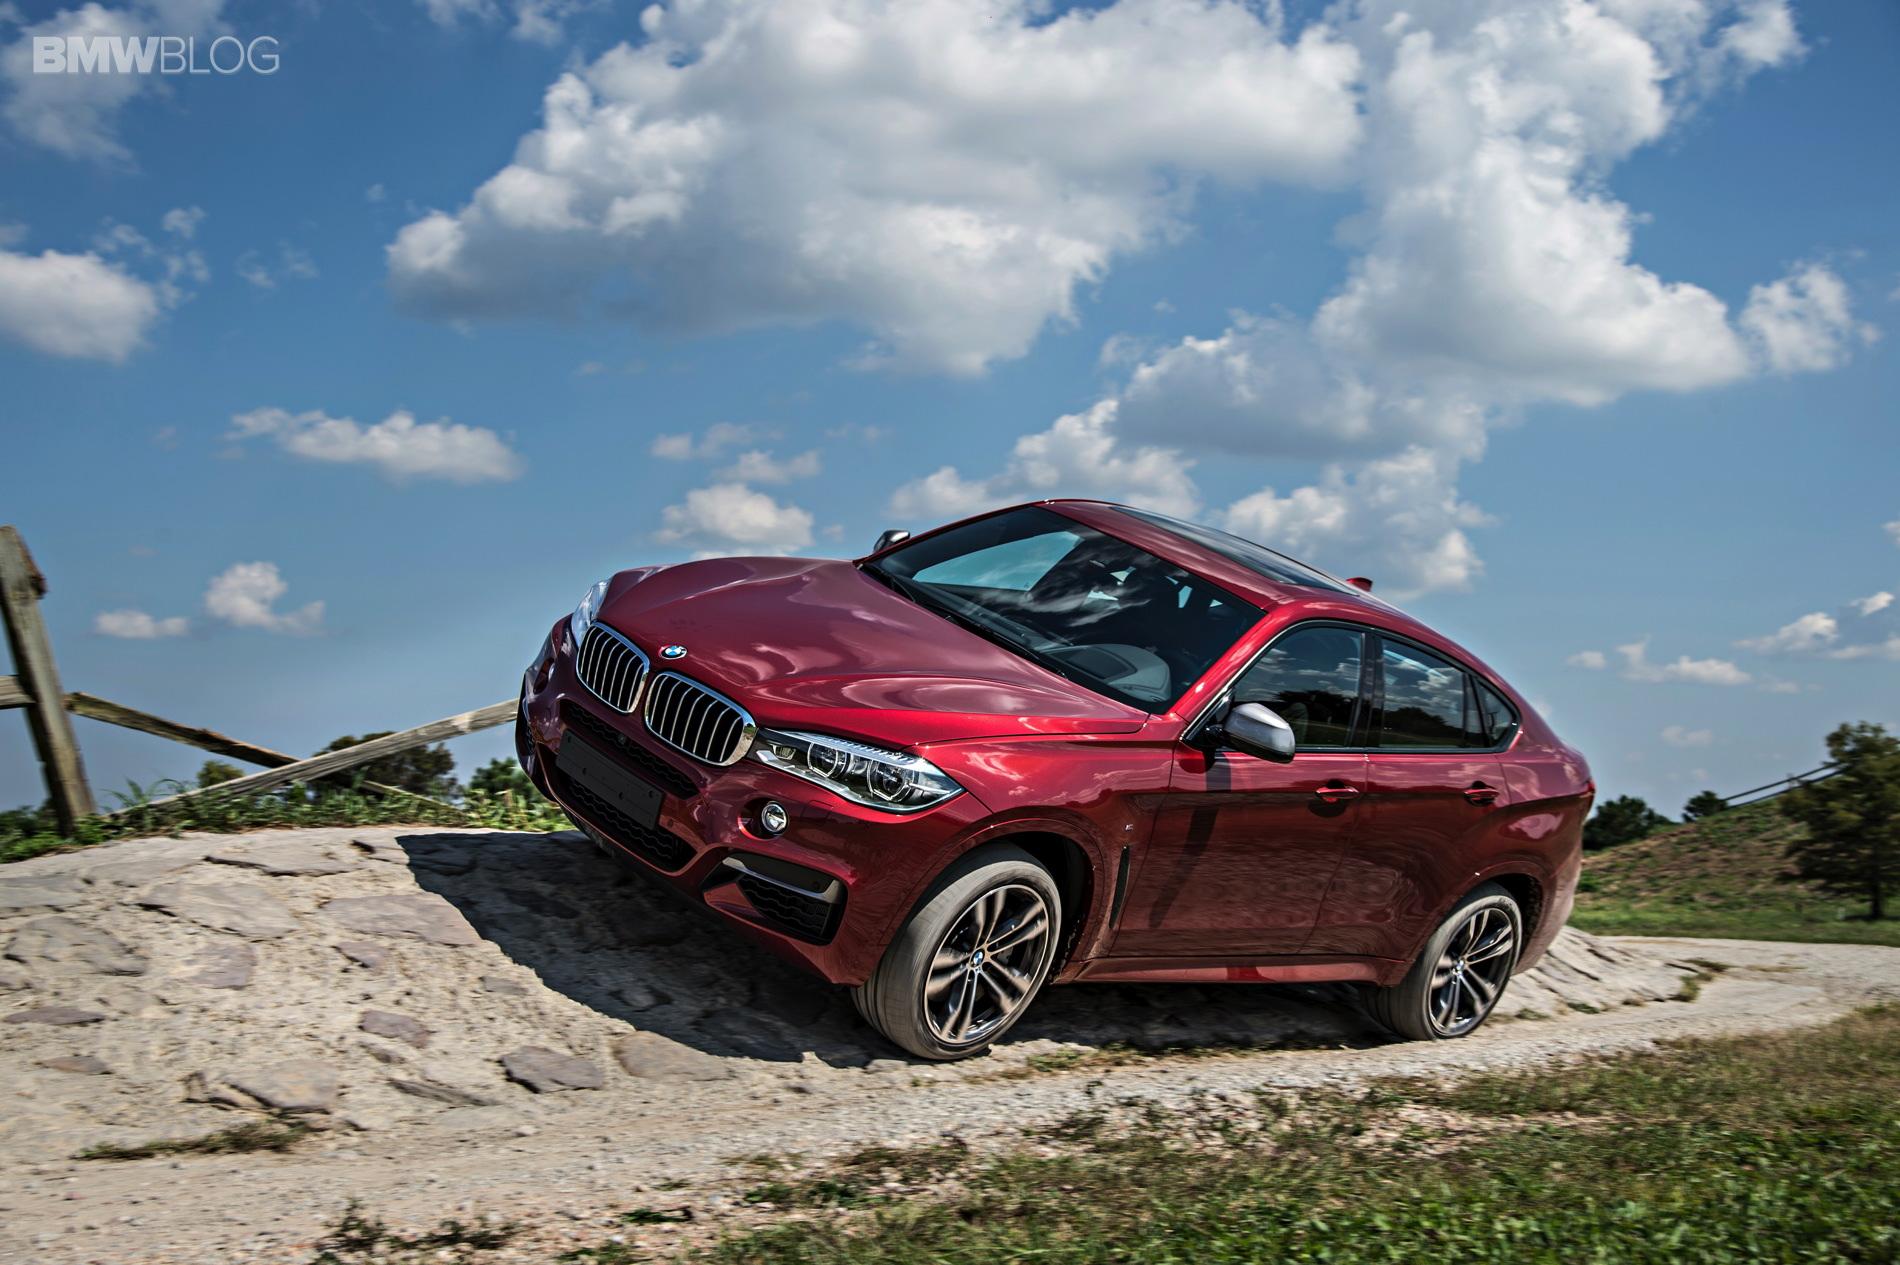 2015 Bmw X6 M50d Review By Car Magazine